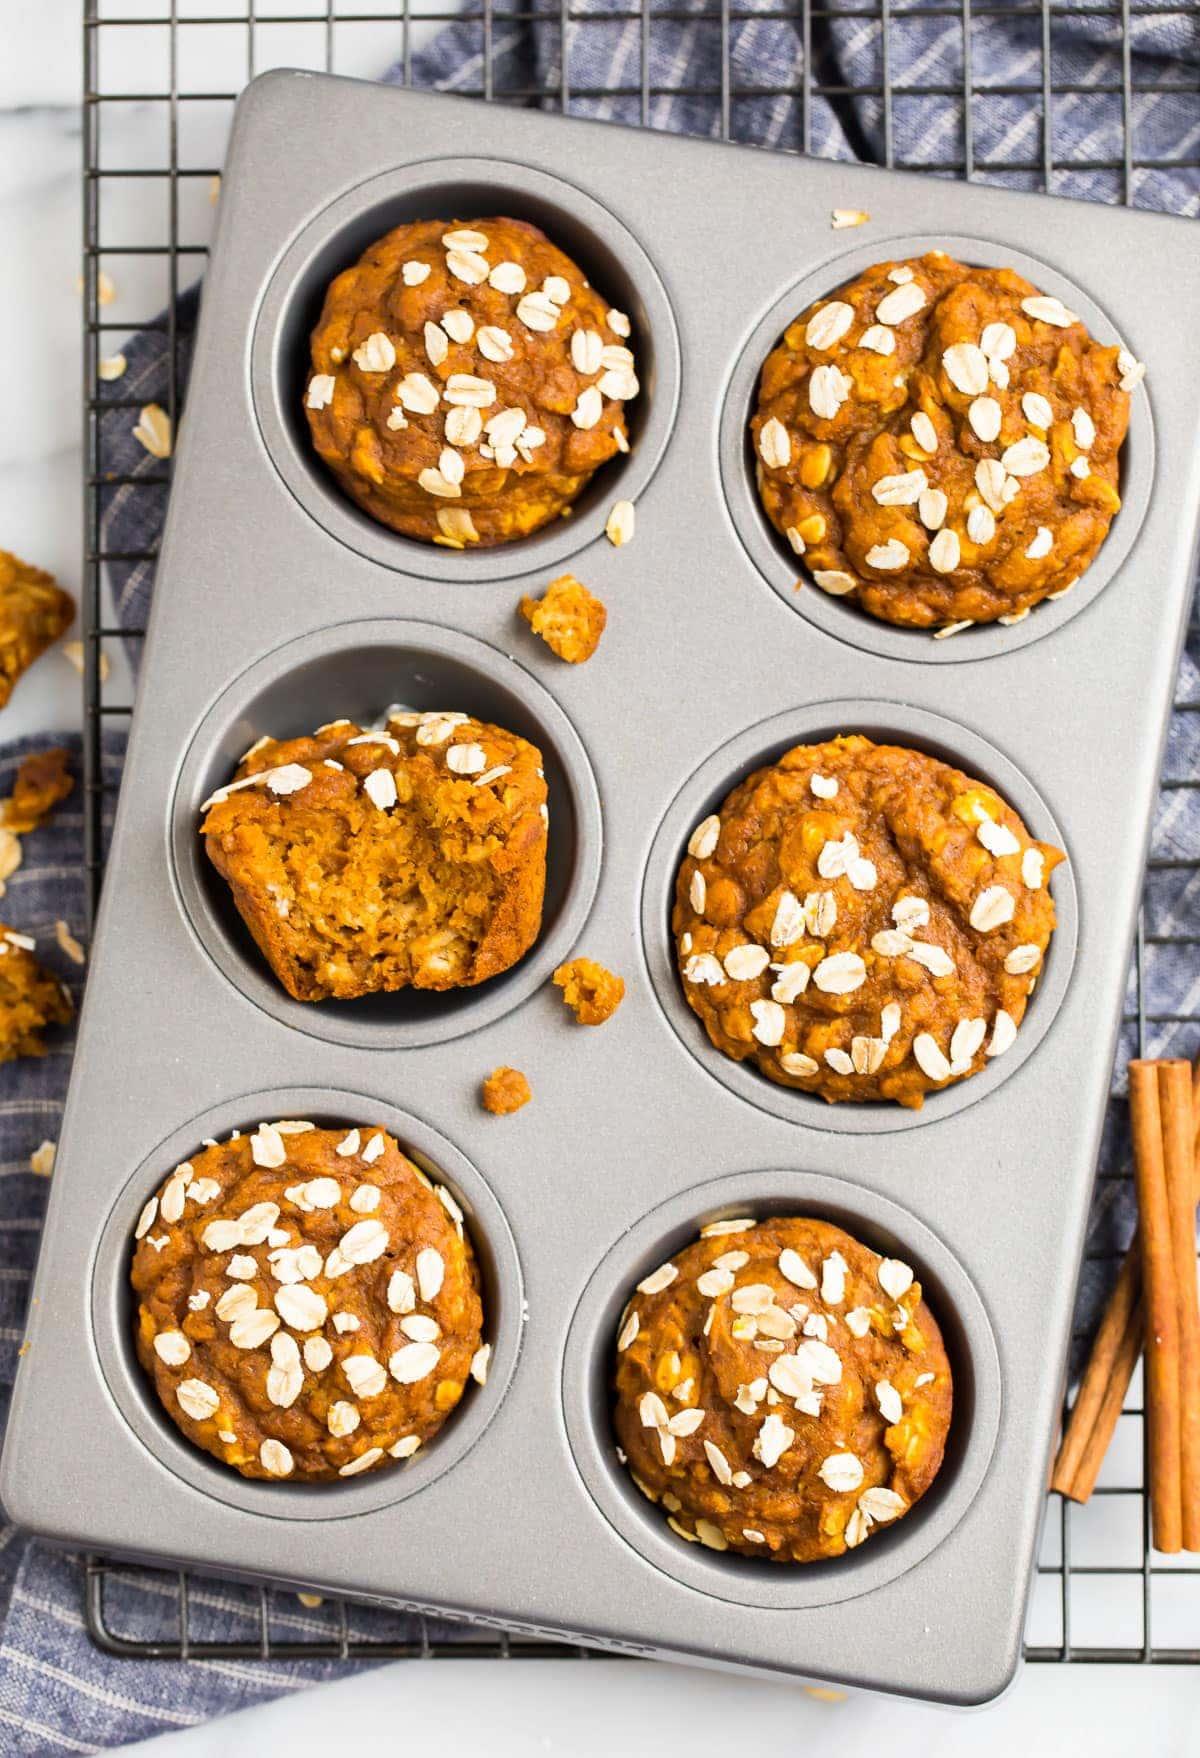 Healthy pumpkin muffins in a muffin pan